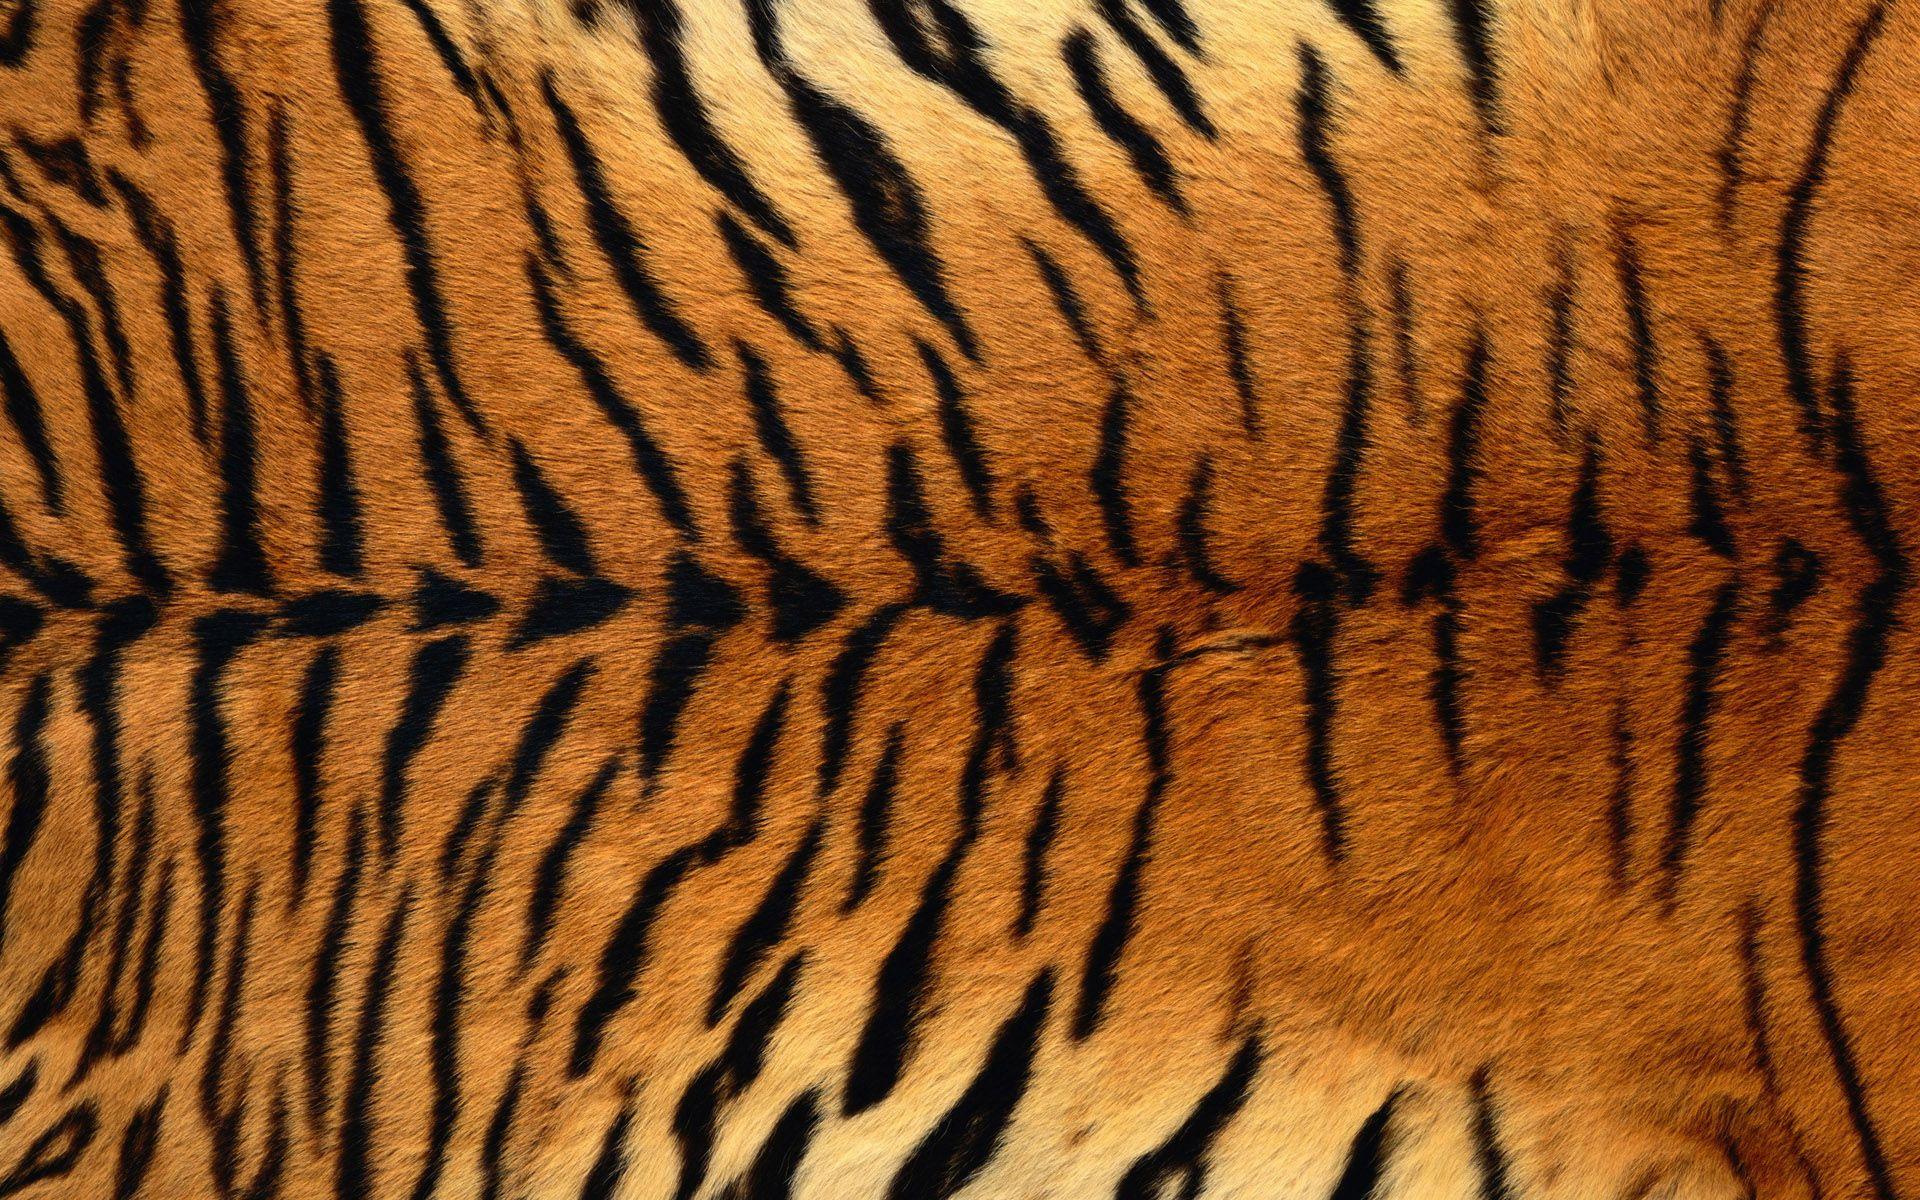 Body Animals Background Pattern Pctures Skin Texture Tiger Animal Print Texture Animal Print Background Tiger Wallpaper